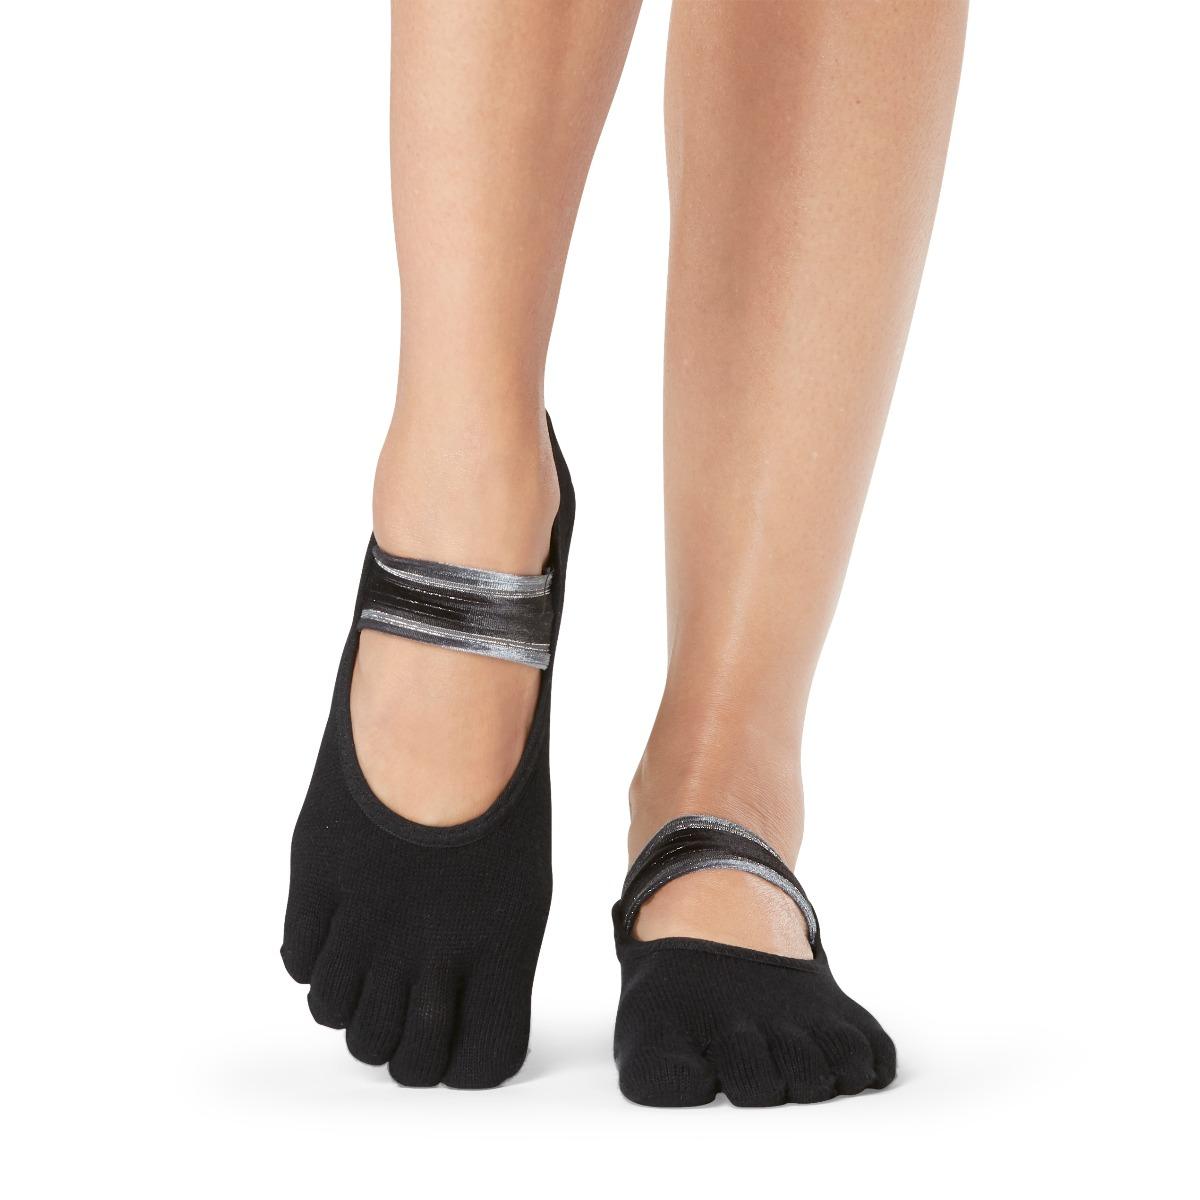 Yogasocken ToeSox Mia Full Toe Maven - 1